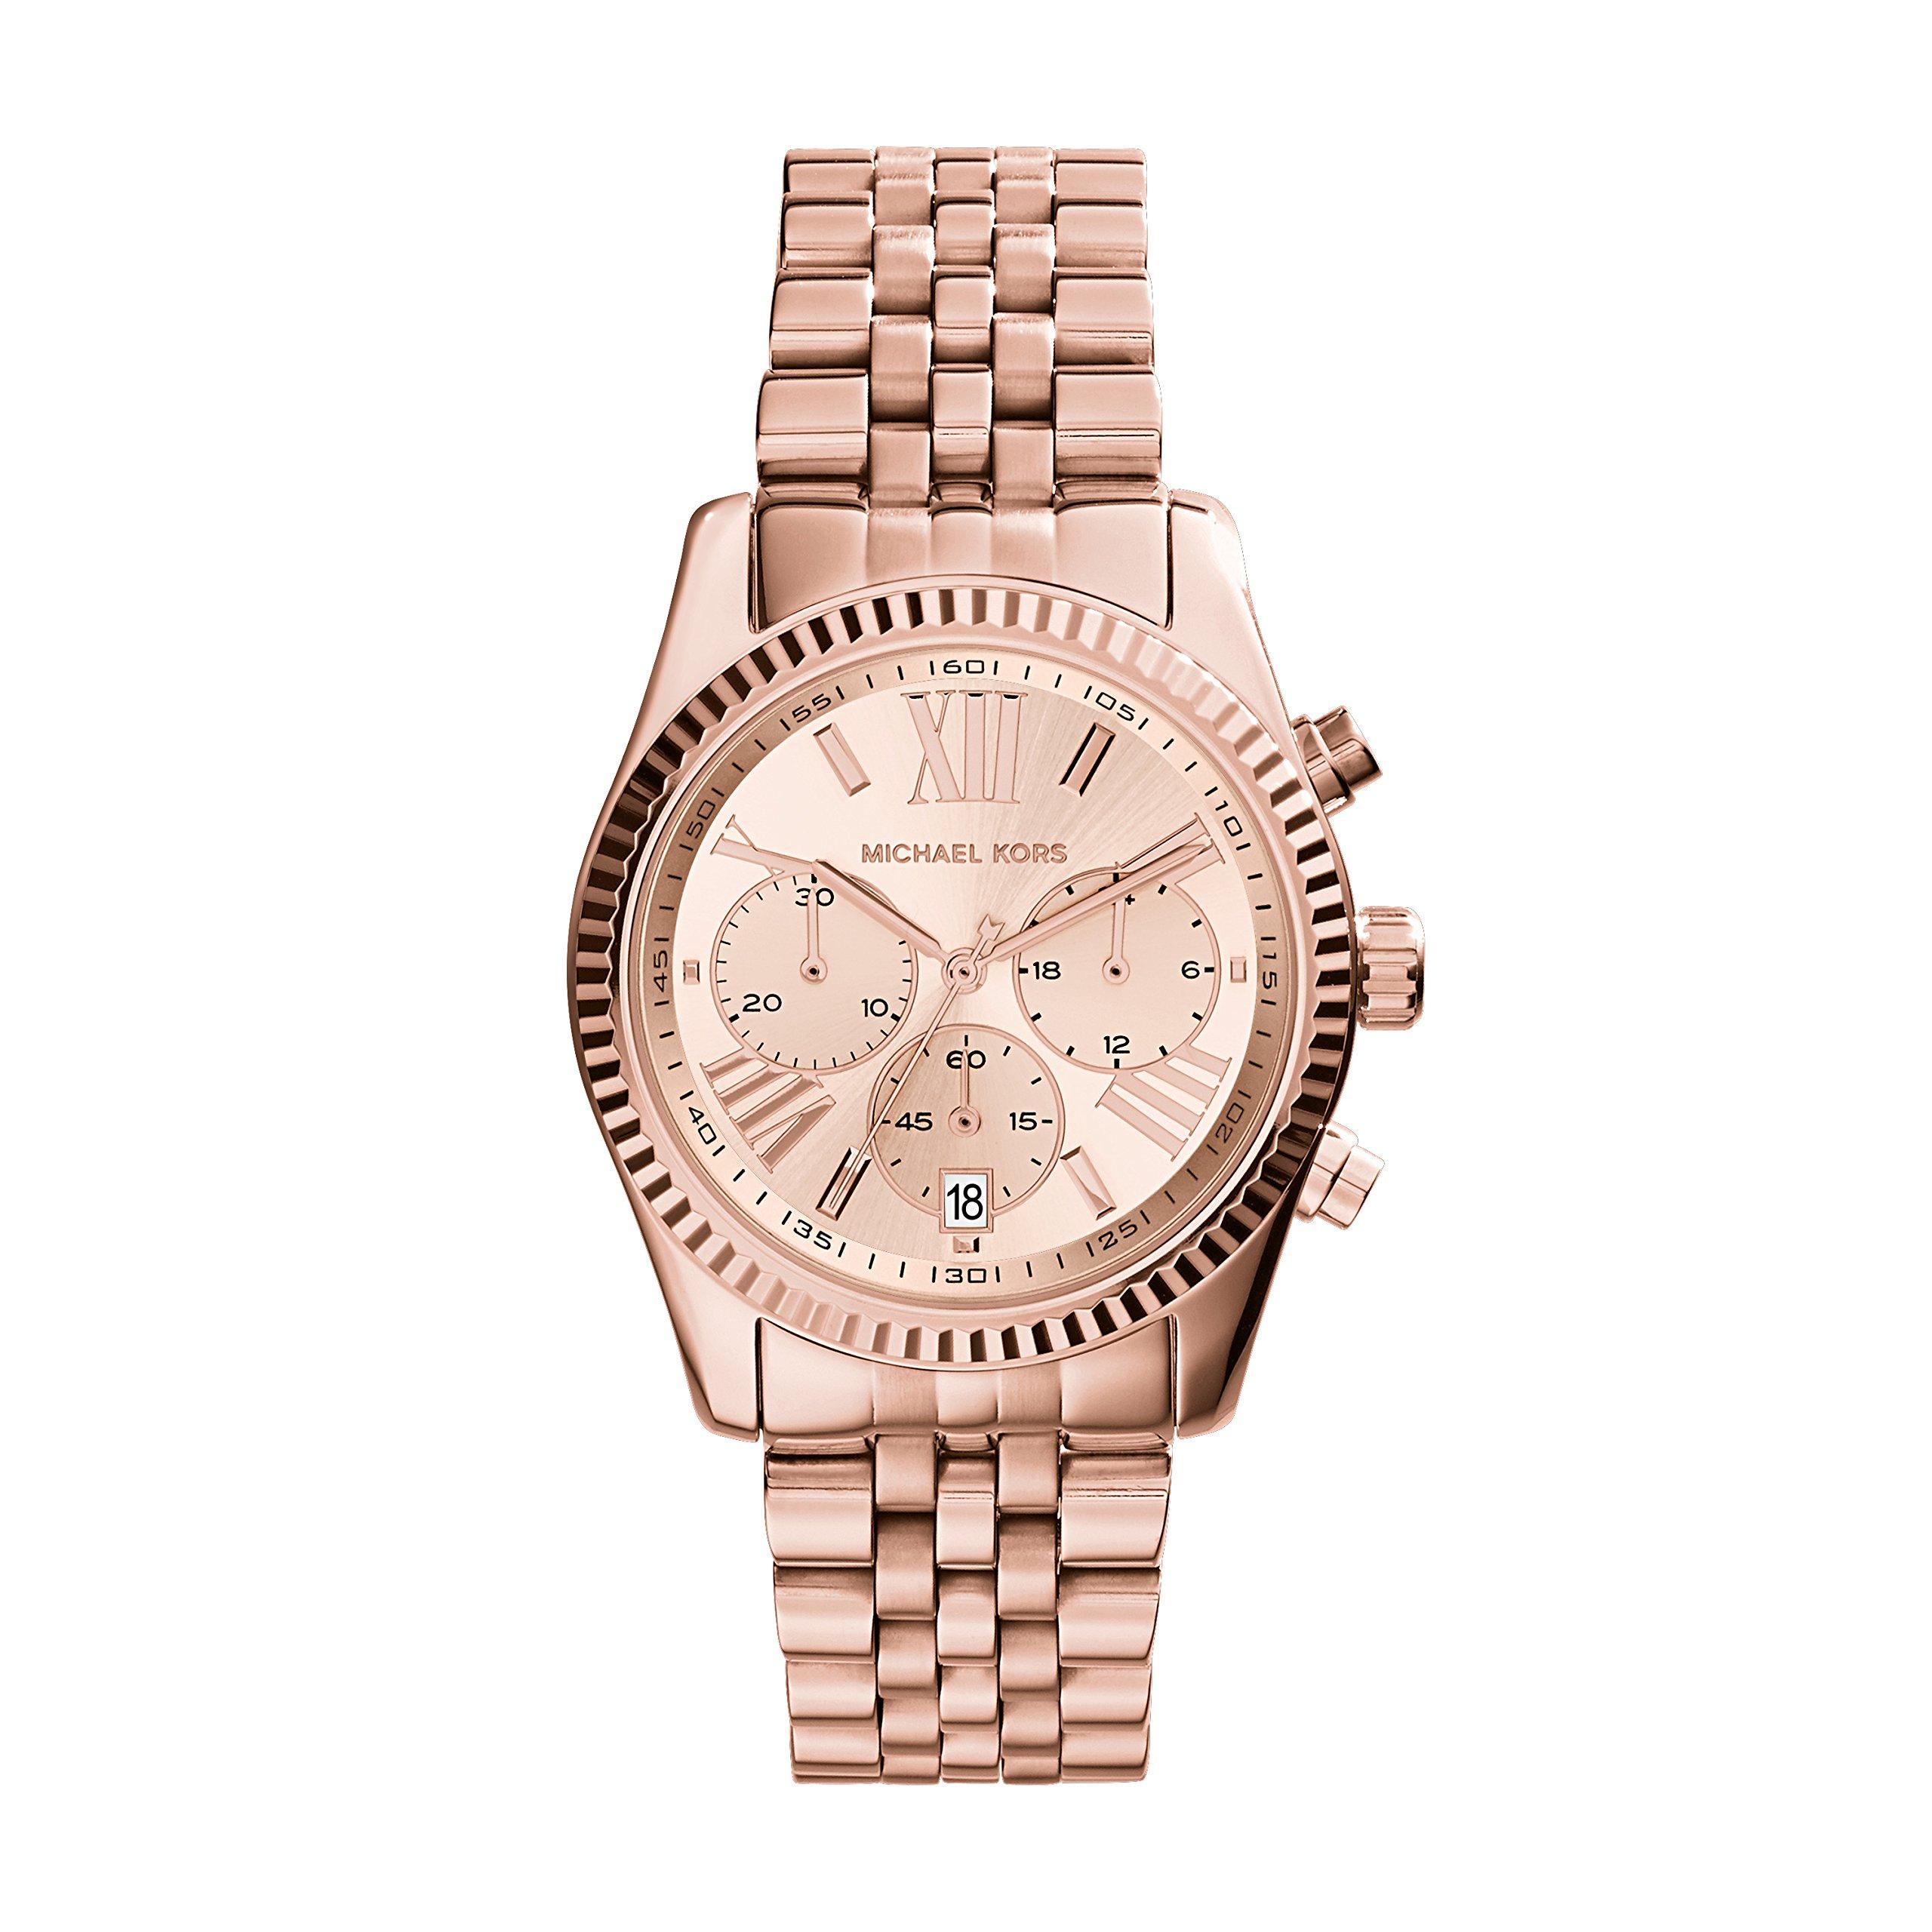 Michael Kors Women's MK5569 Lexington Rose Gold-Tone Stainless Steel Watch by Michael Kors